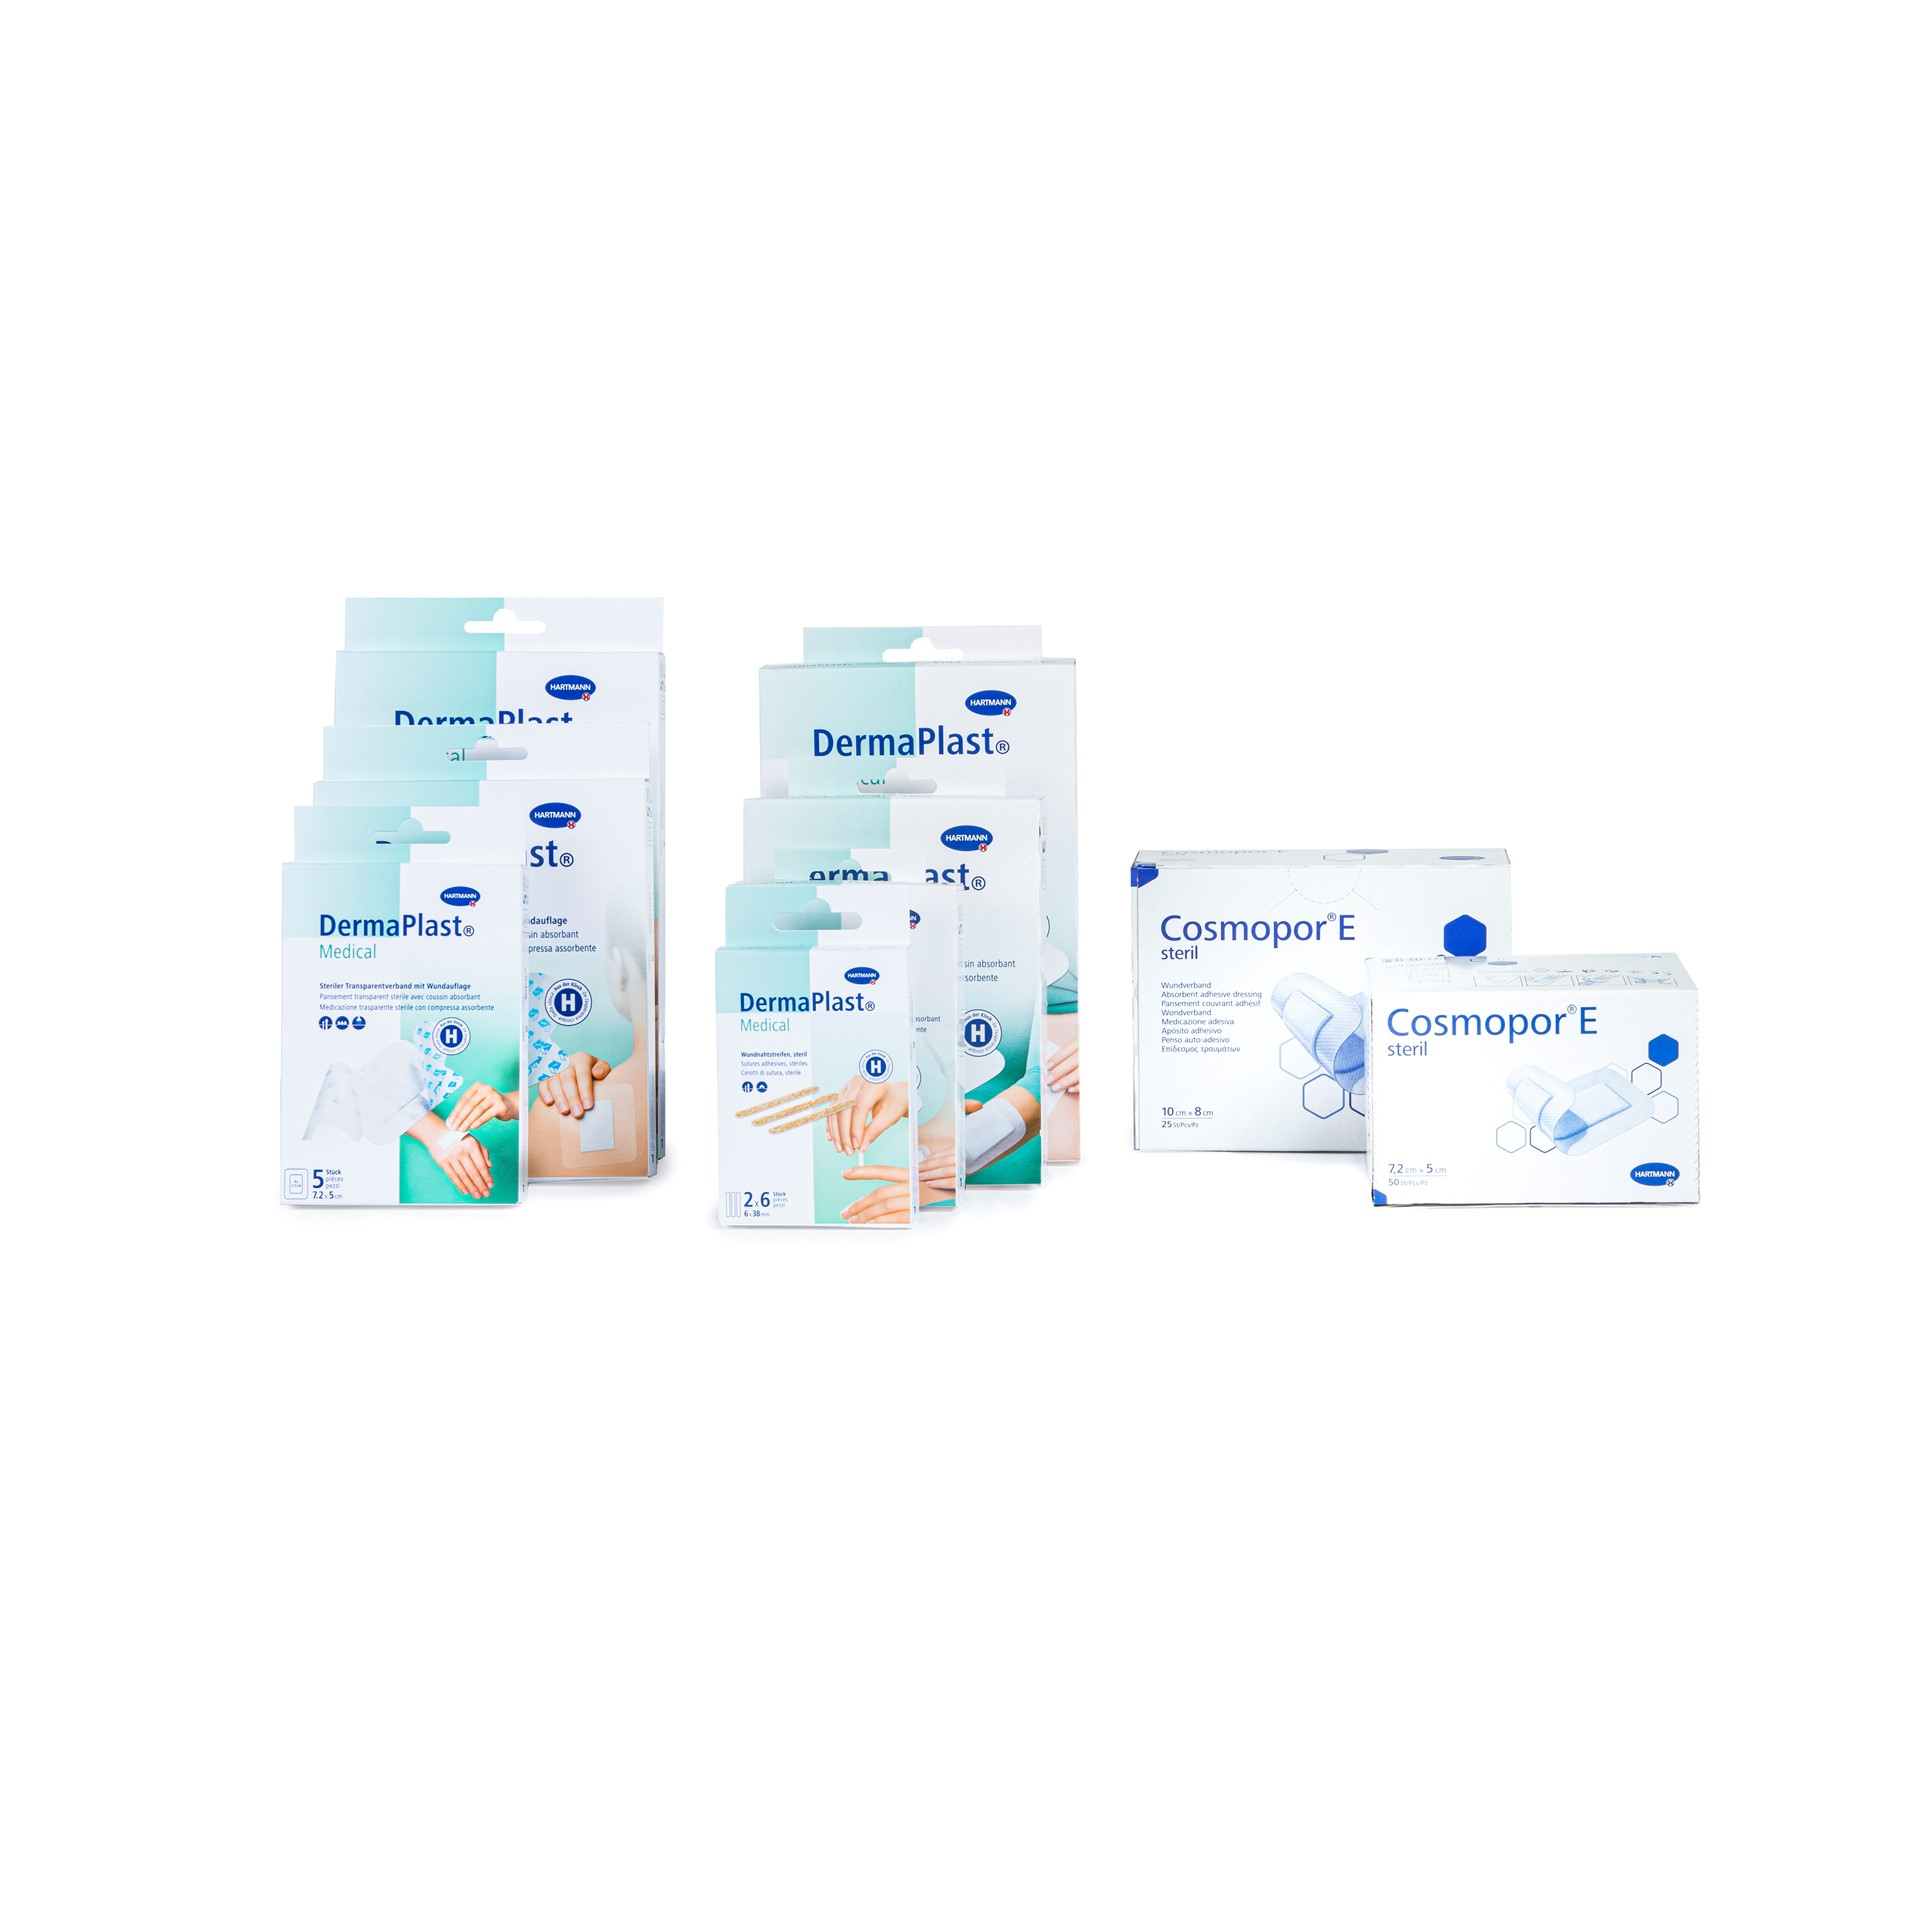 Bild für Kategorie Sterile Pflaster